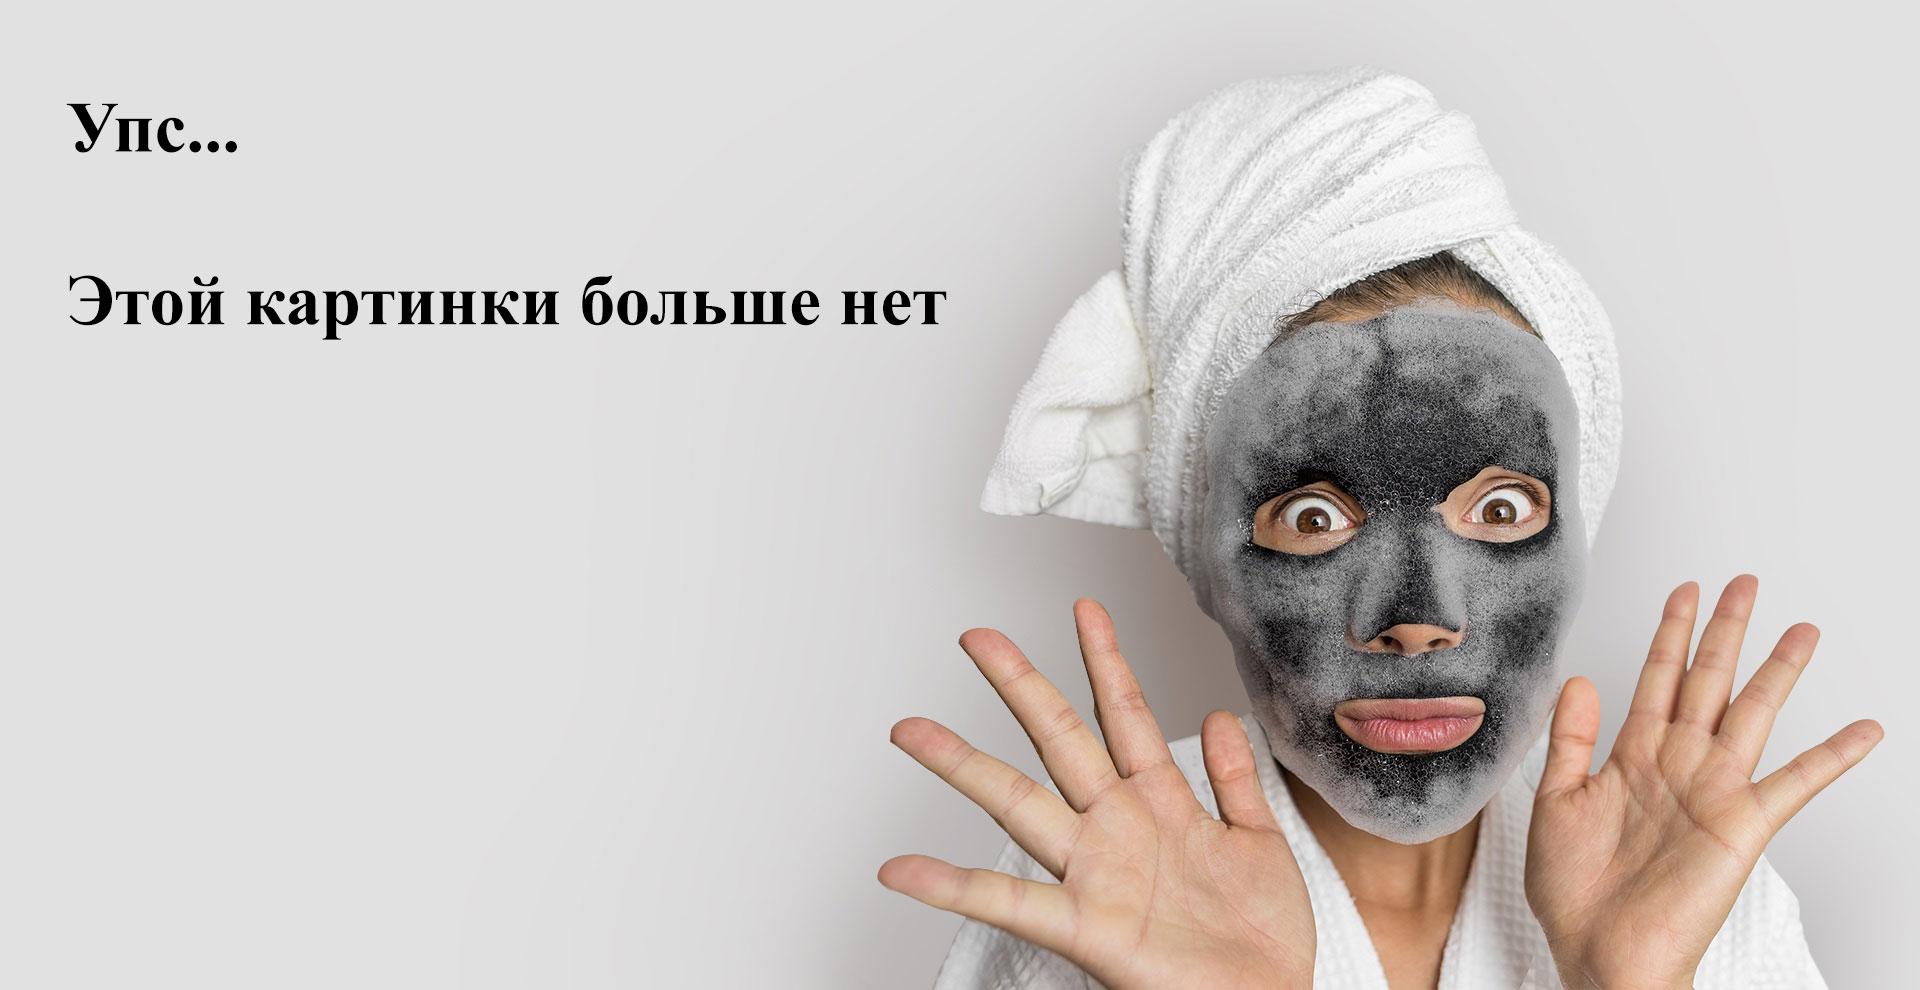 Patrisa Nail, Гель-лак Московская сага №758